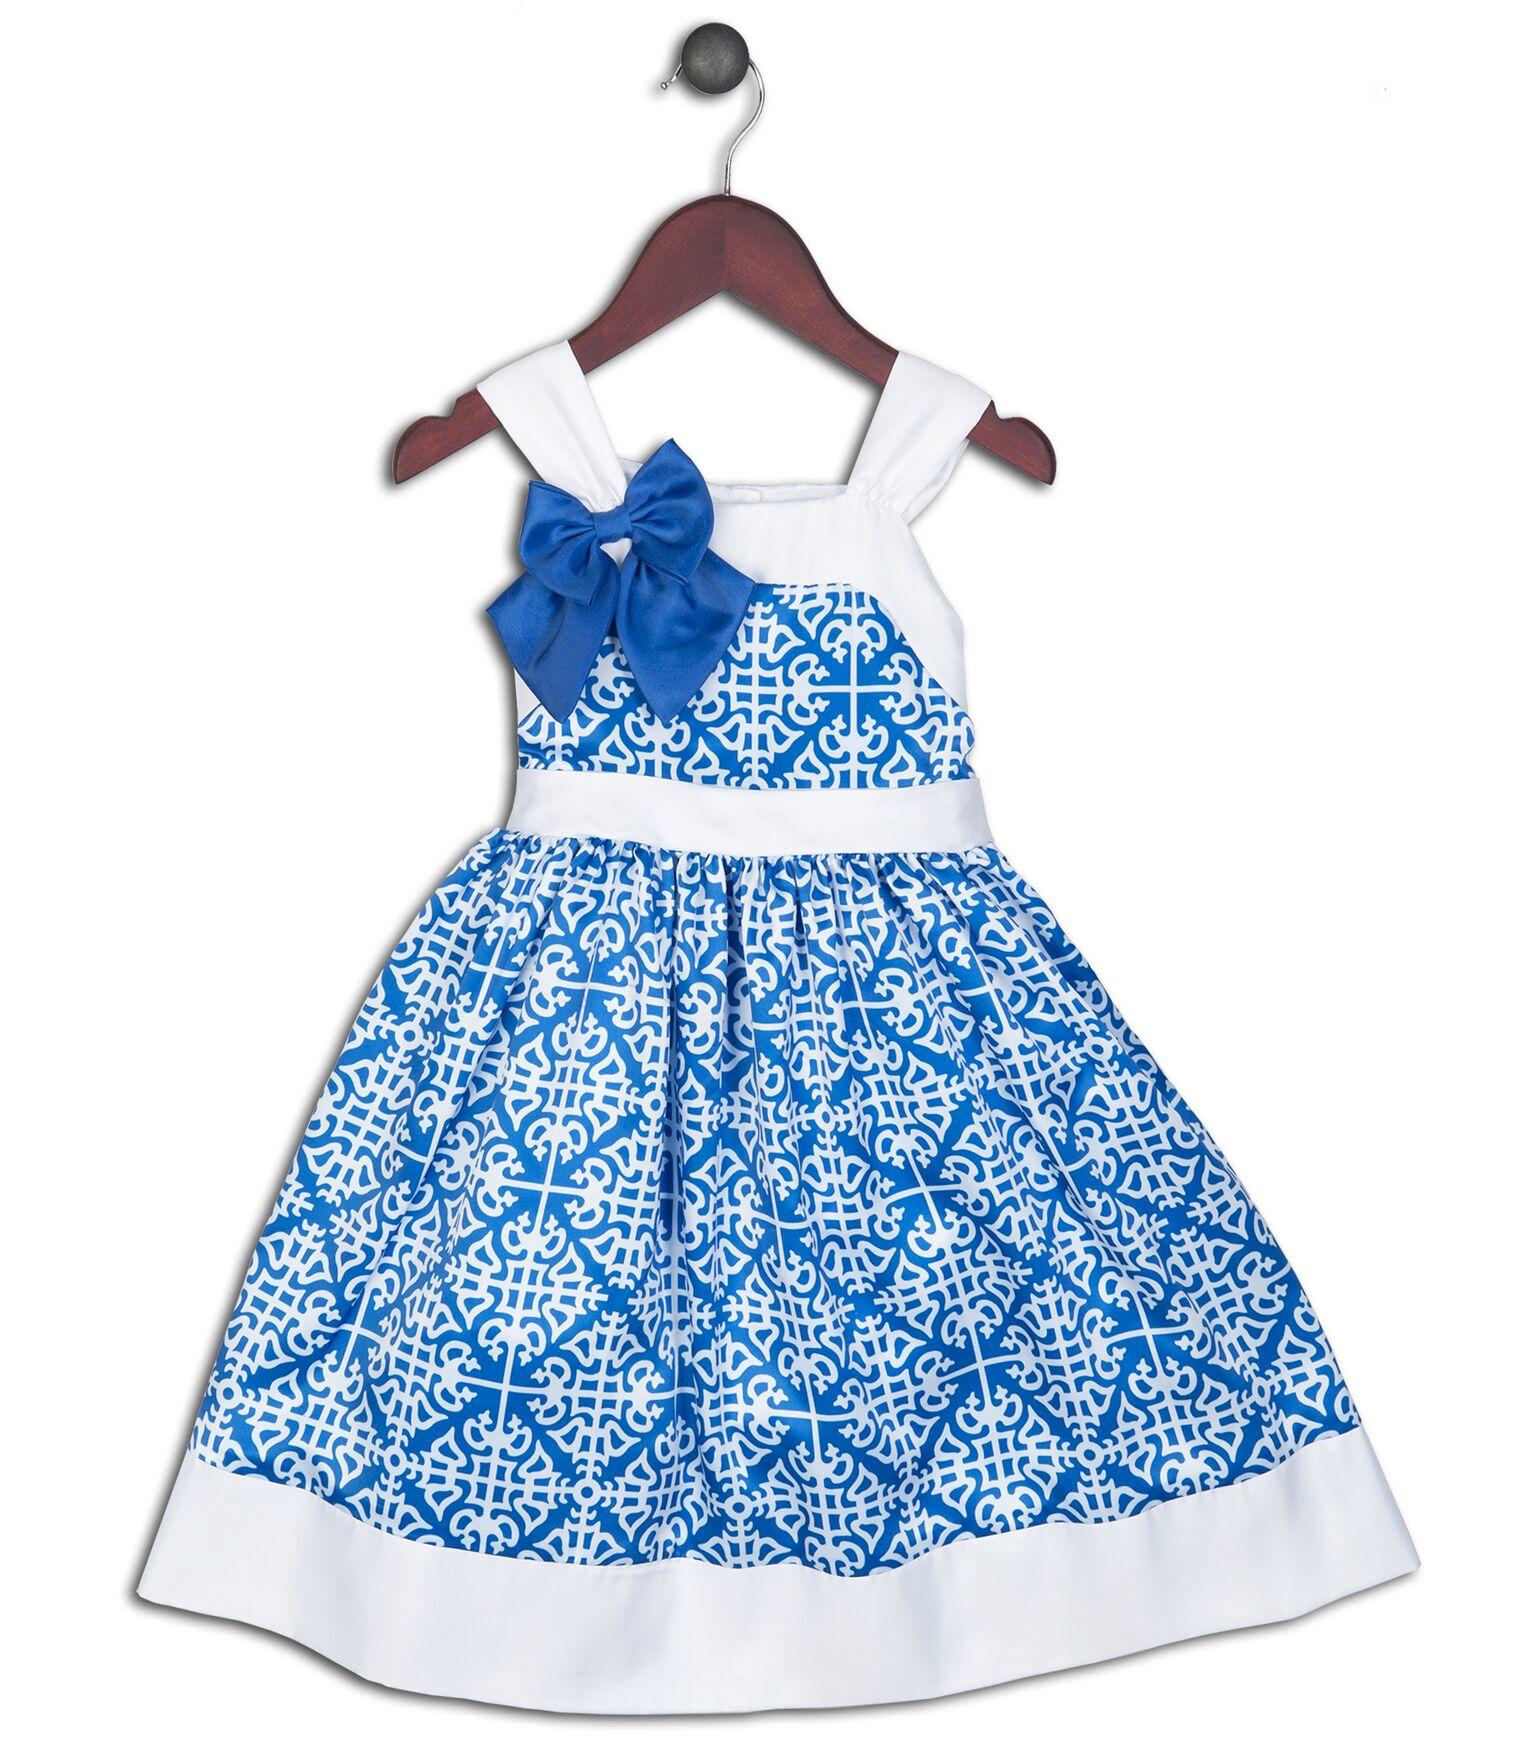 Joe and Ella Fashion Dievčenské šaty Christina - bielo-modré 4d58835f148